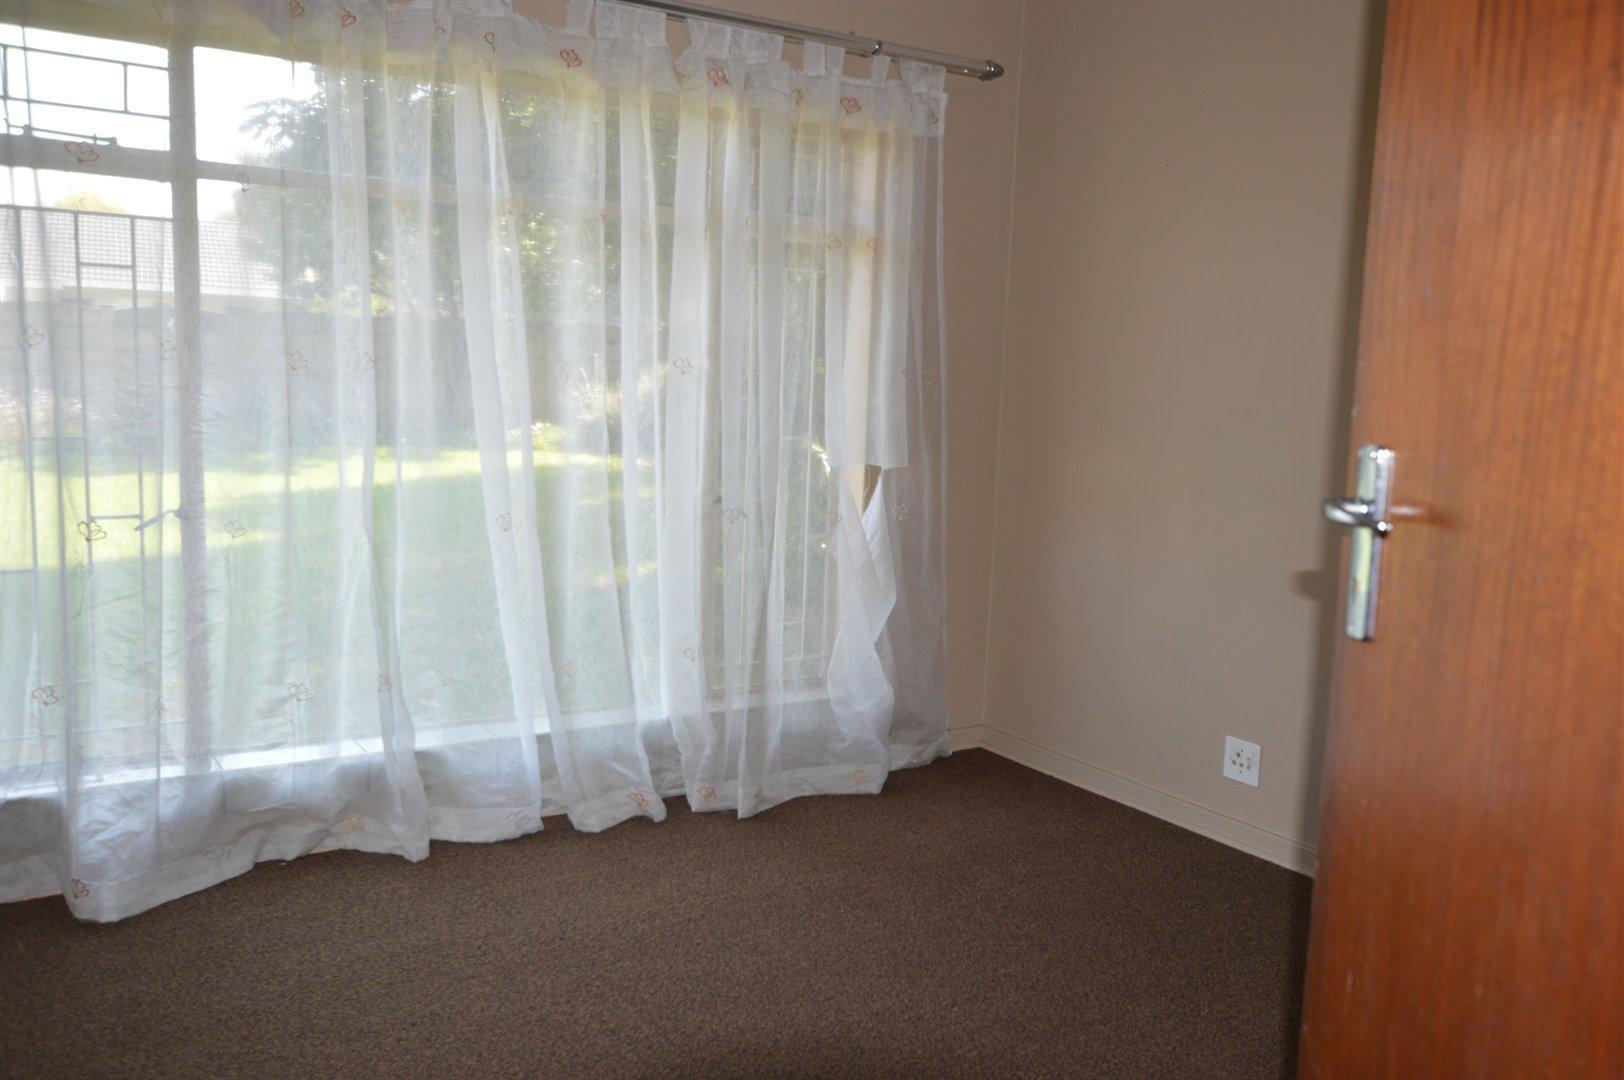 Vanderbijlpark Se 2 property for sale. Ref No: 13623209. Picture no 16